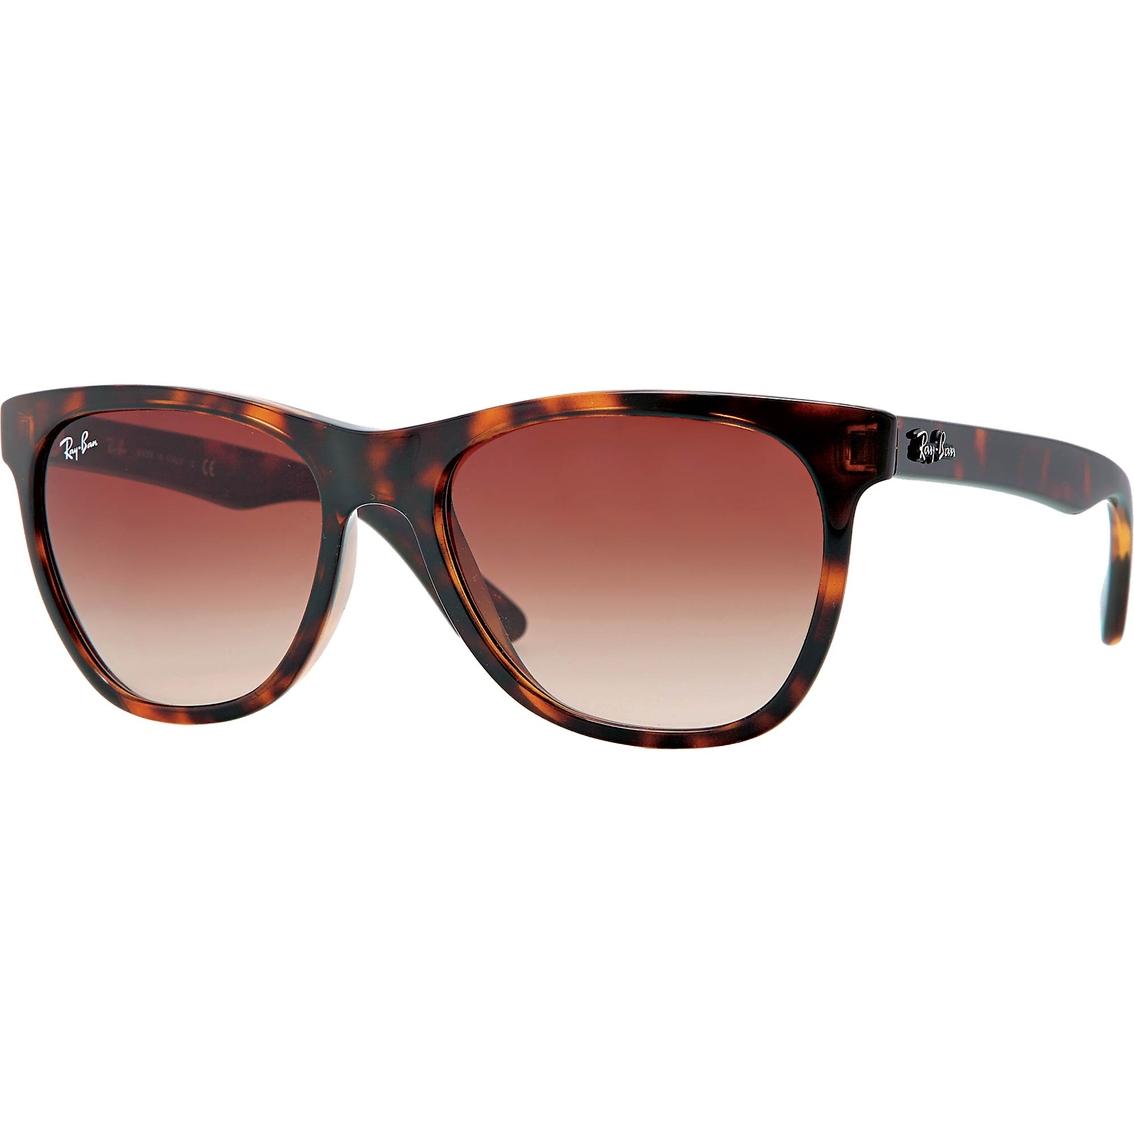 Oakley Half Jacket 2 0 Xl >> Price Of Rayban Sunglass Of Model No Bb-3026 62014-138 ...